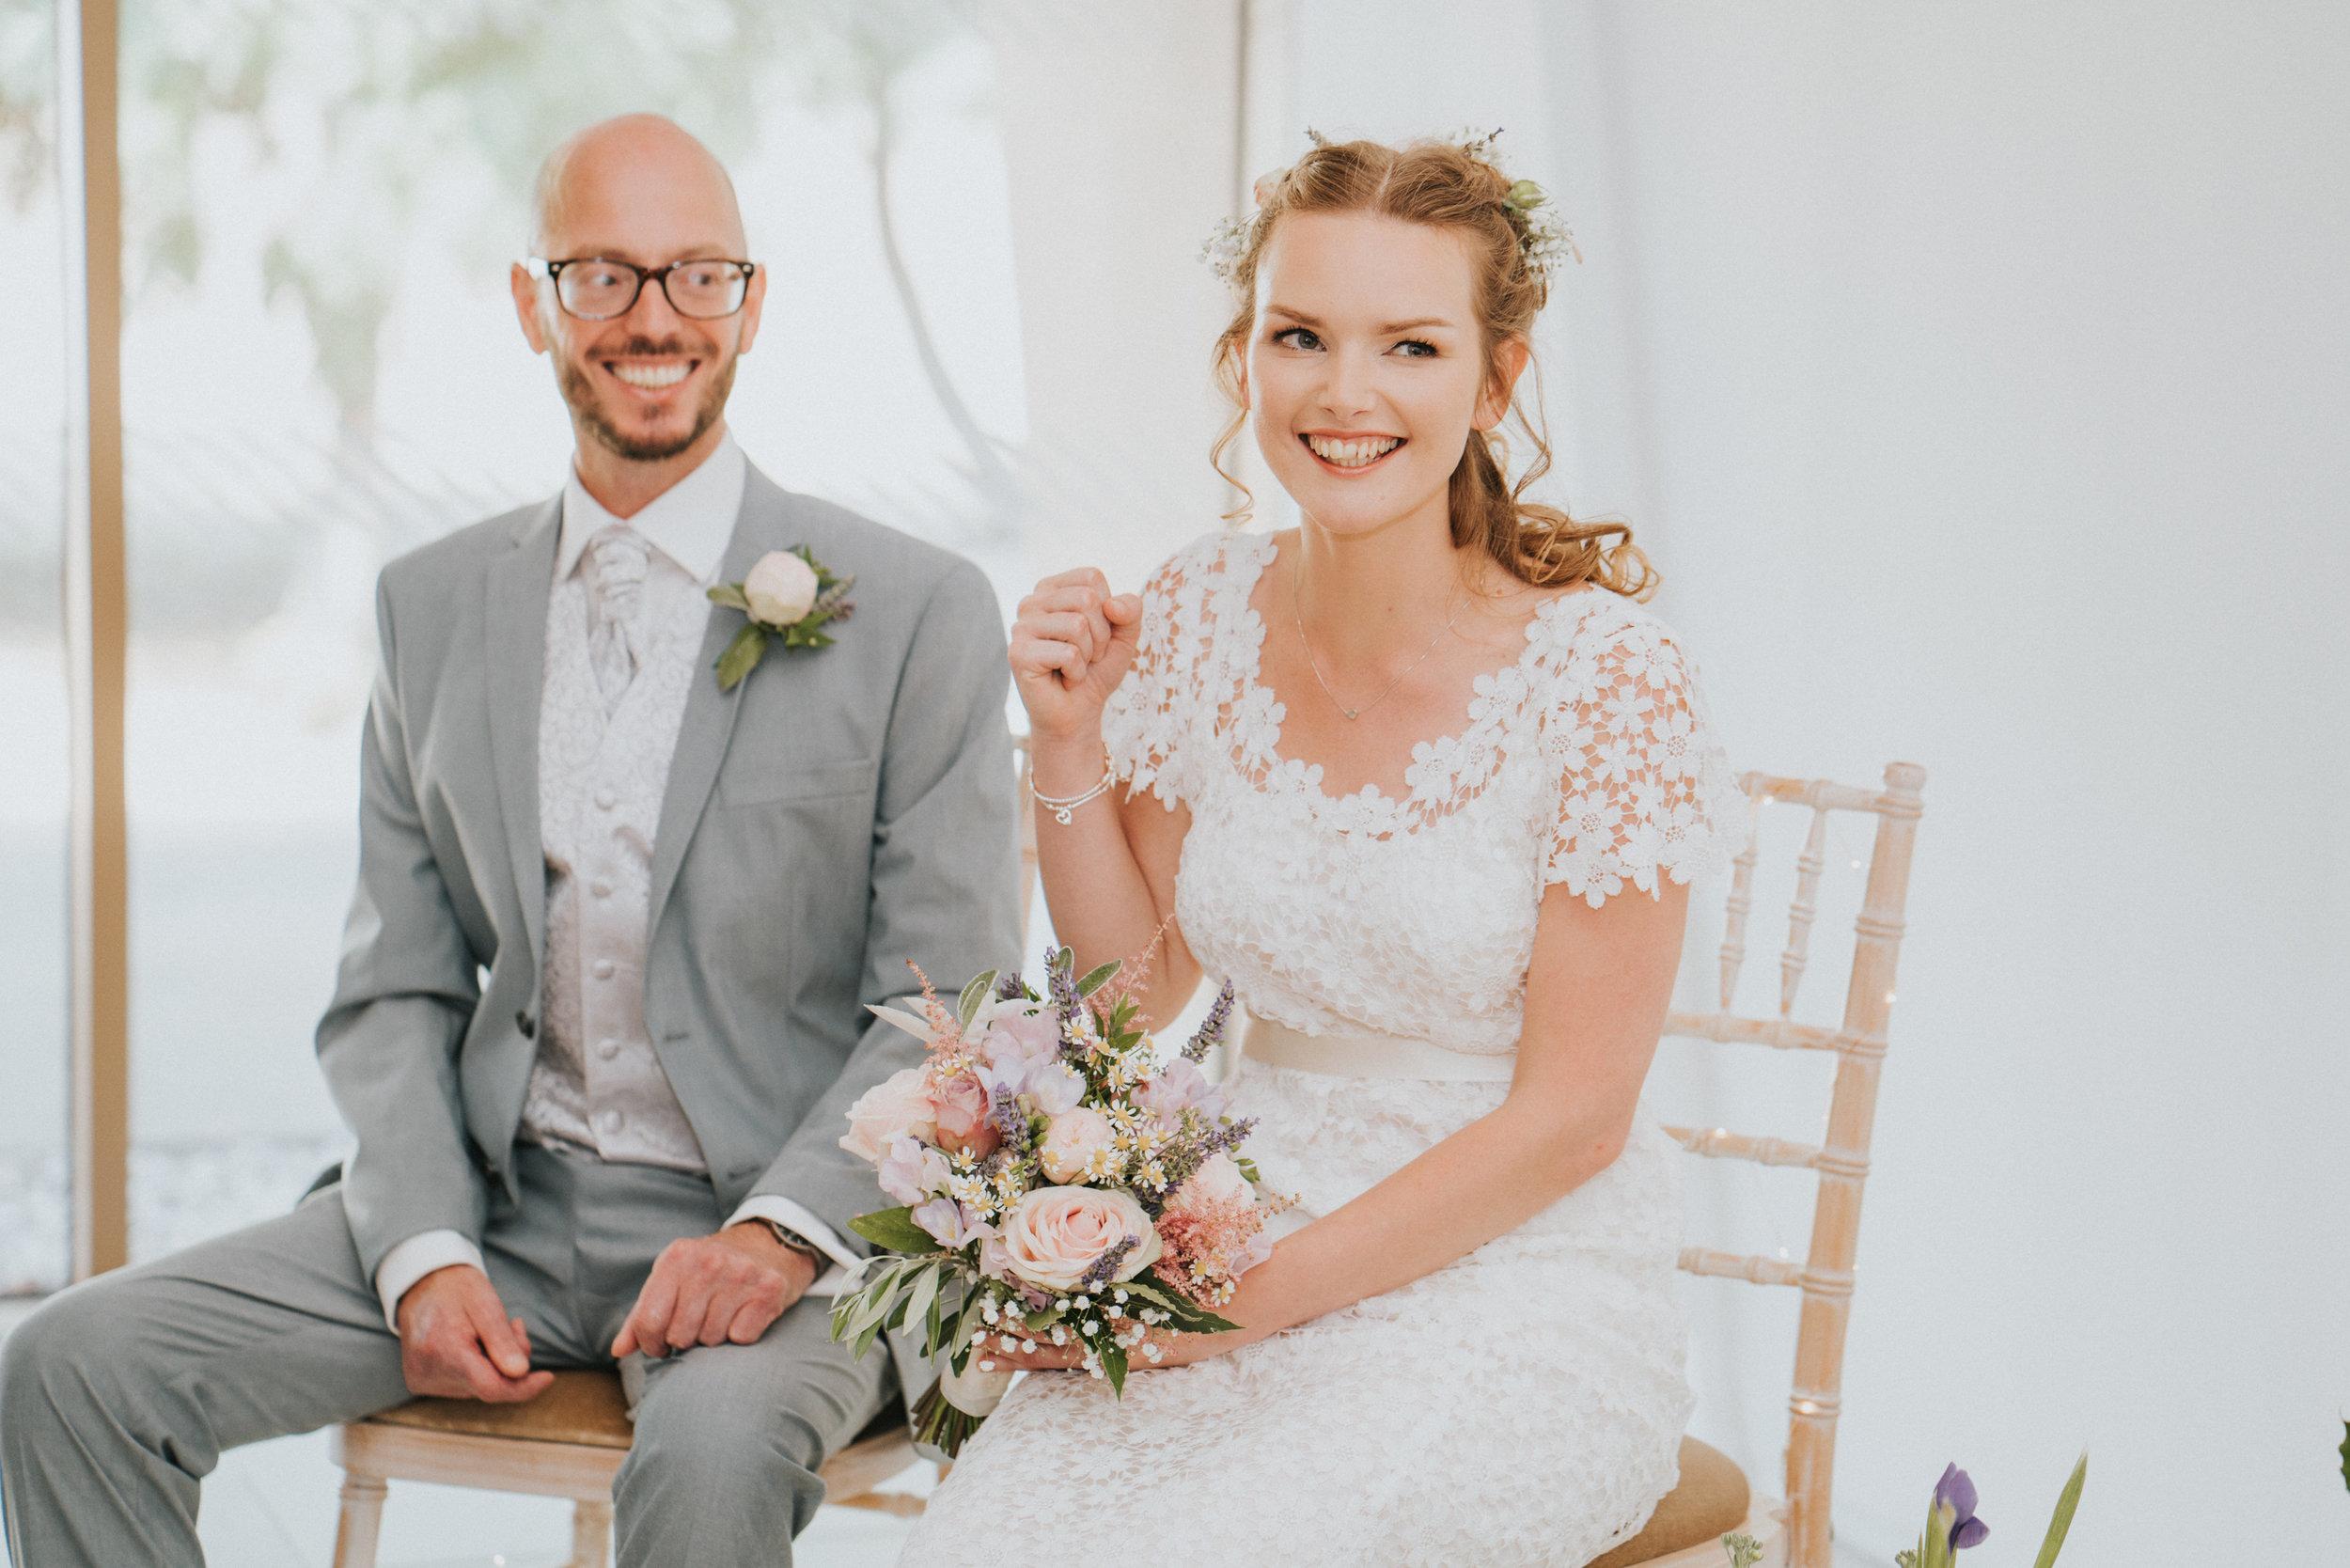 Grace-Elizabeth-Georgie-Amalaketu-Firstsite-Colchester-Essex-Boho-Buddhist-Wedding-Alternative-Wedding-Photography-Essex (47 of 100).jpg